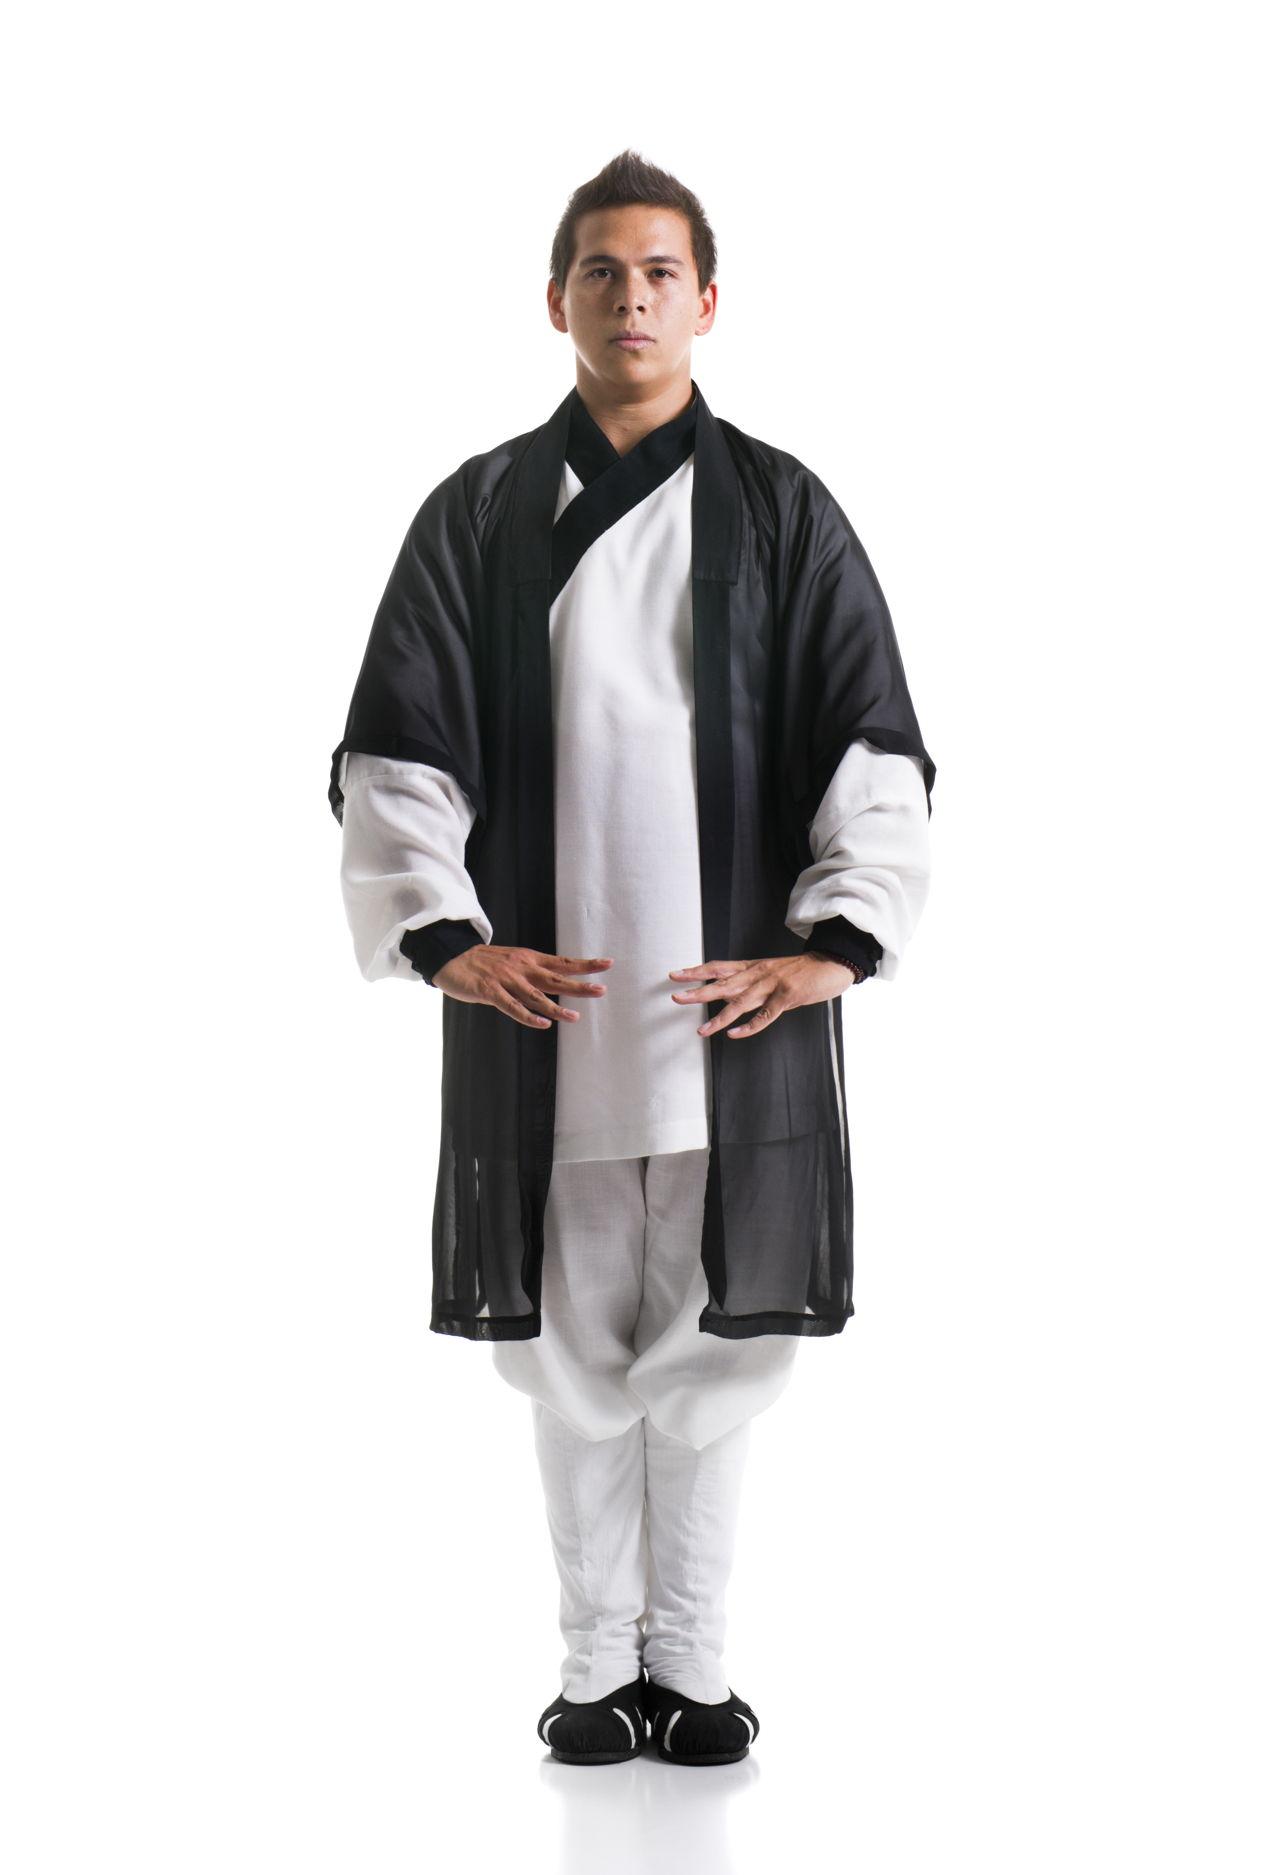 fu kung styles master shaolin martial arts moves famous